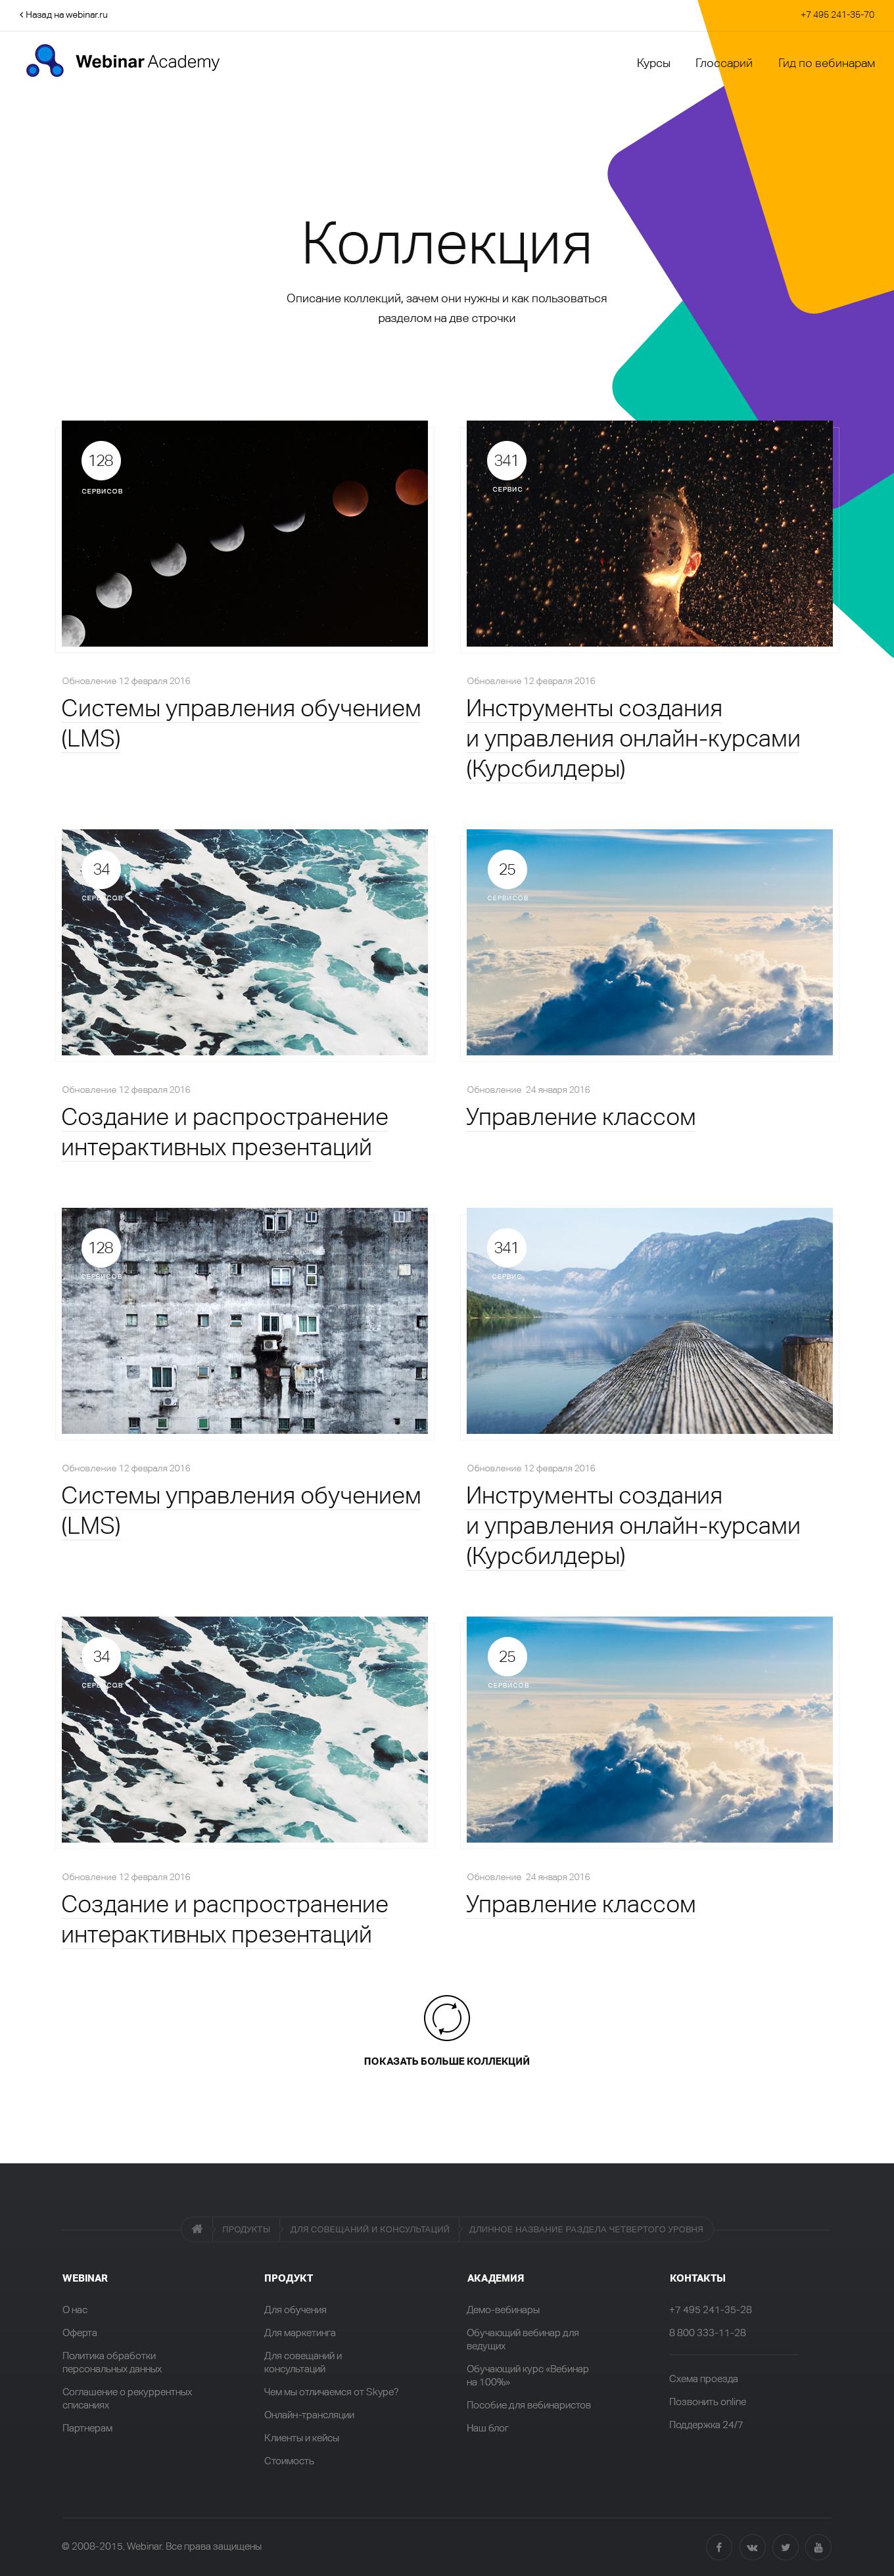 webinar_academy_list_of_collections